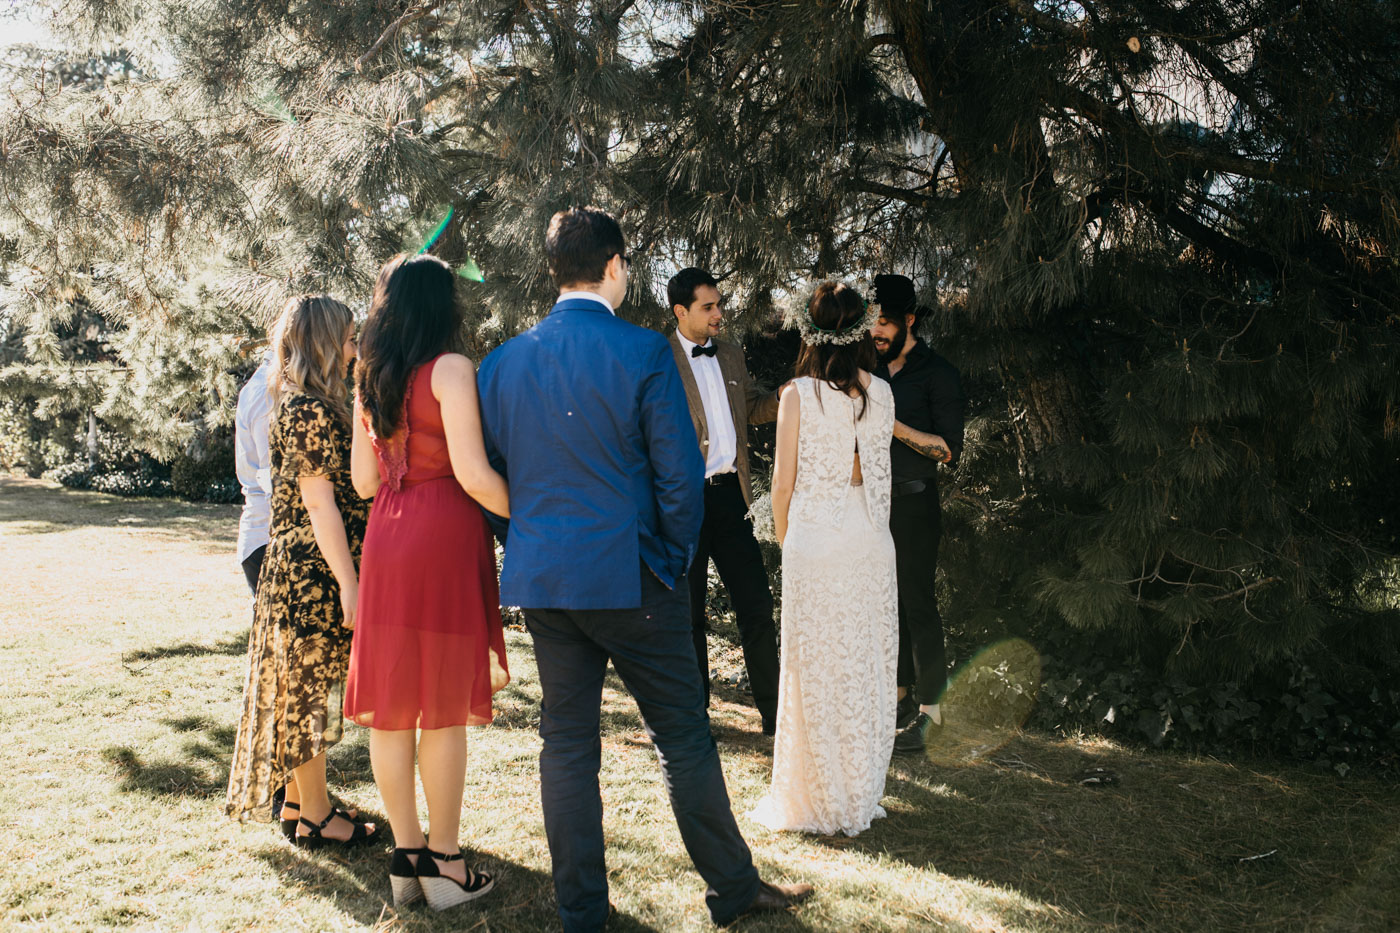 Velvet-Hush-fotografos-boda-al-aire-libre-madrid-031